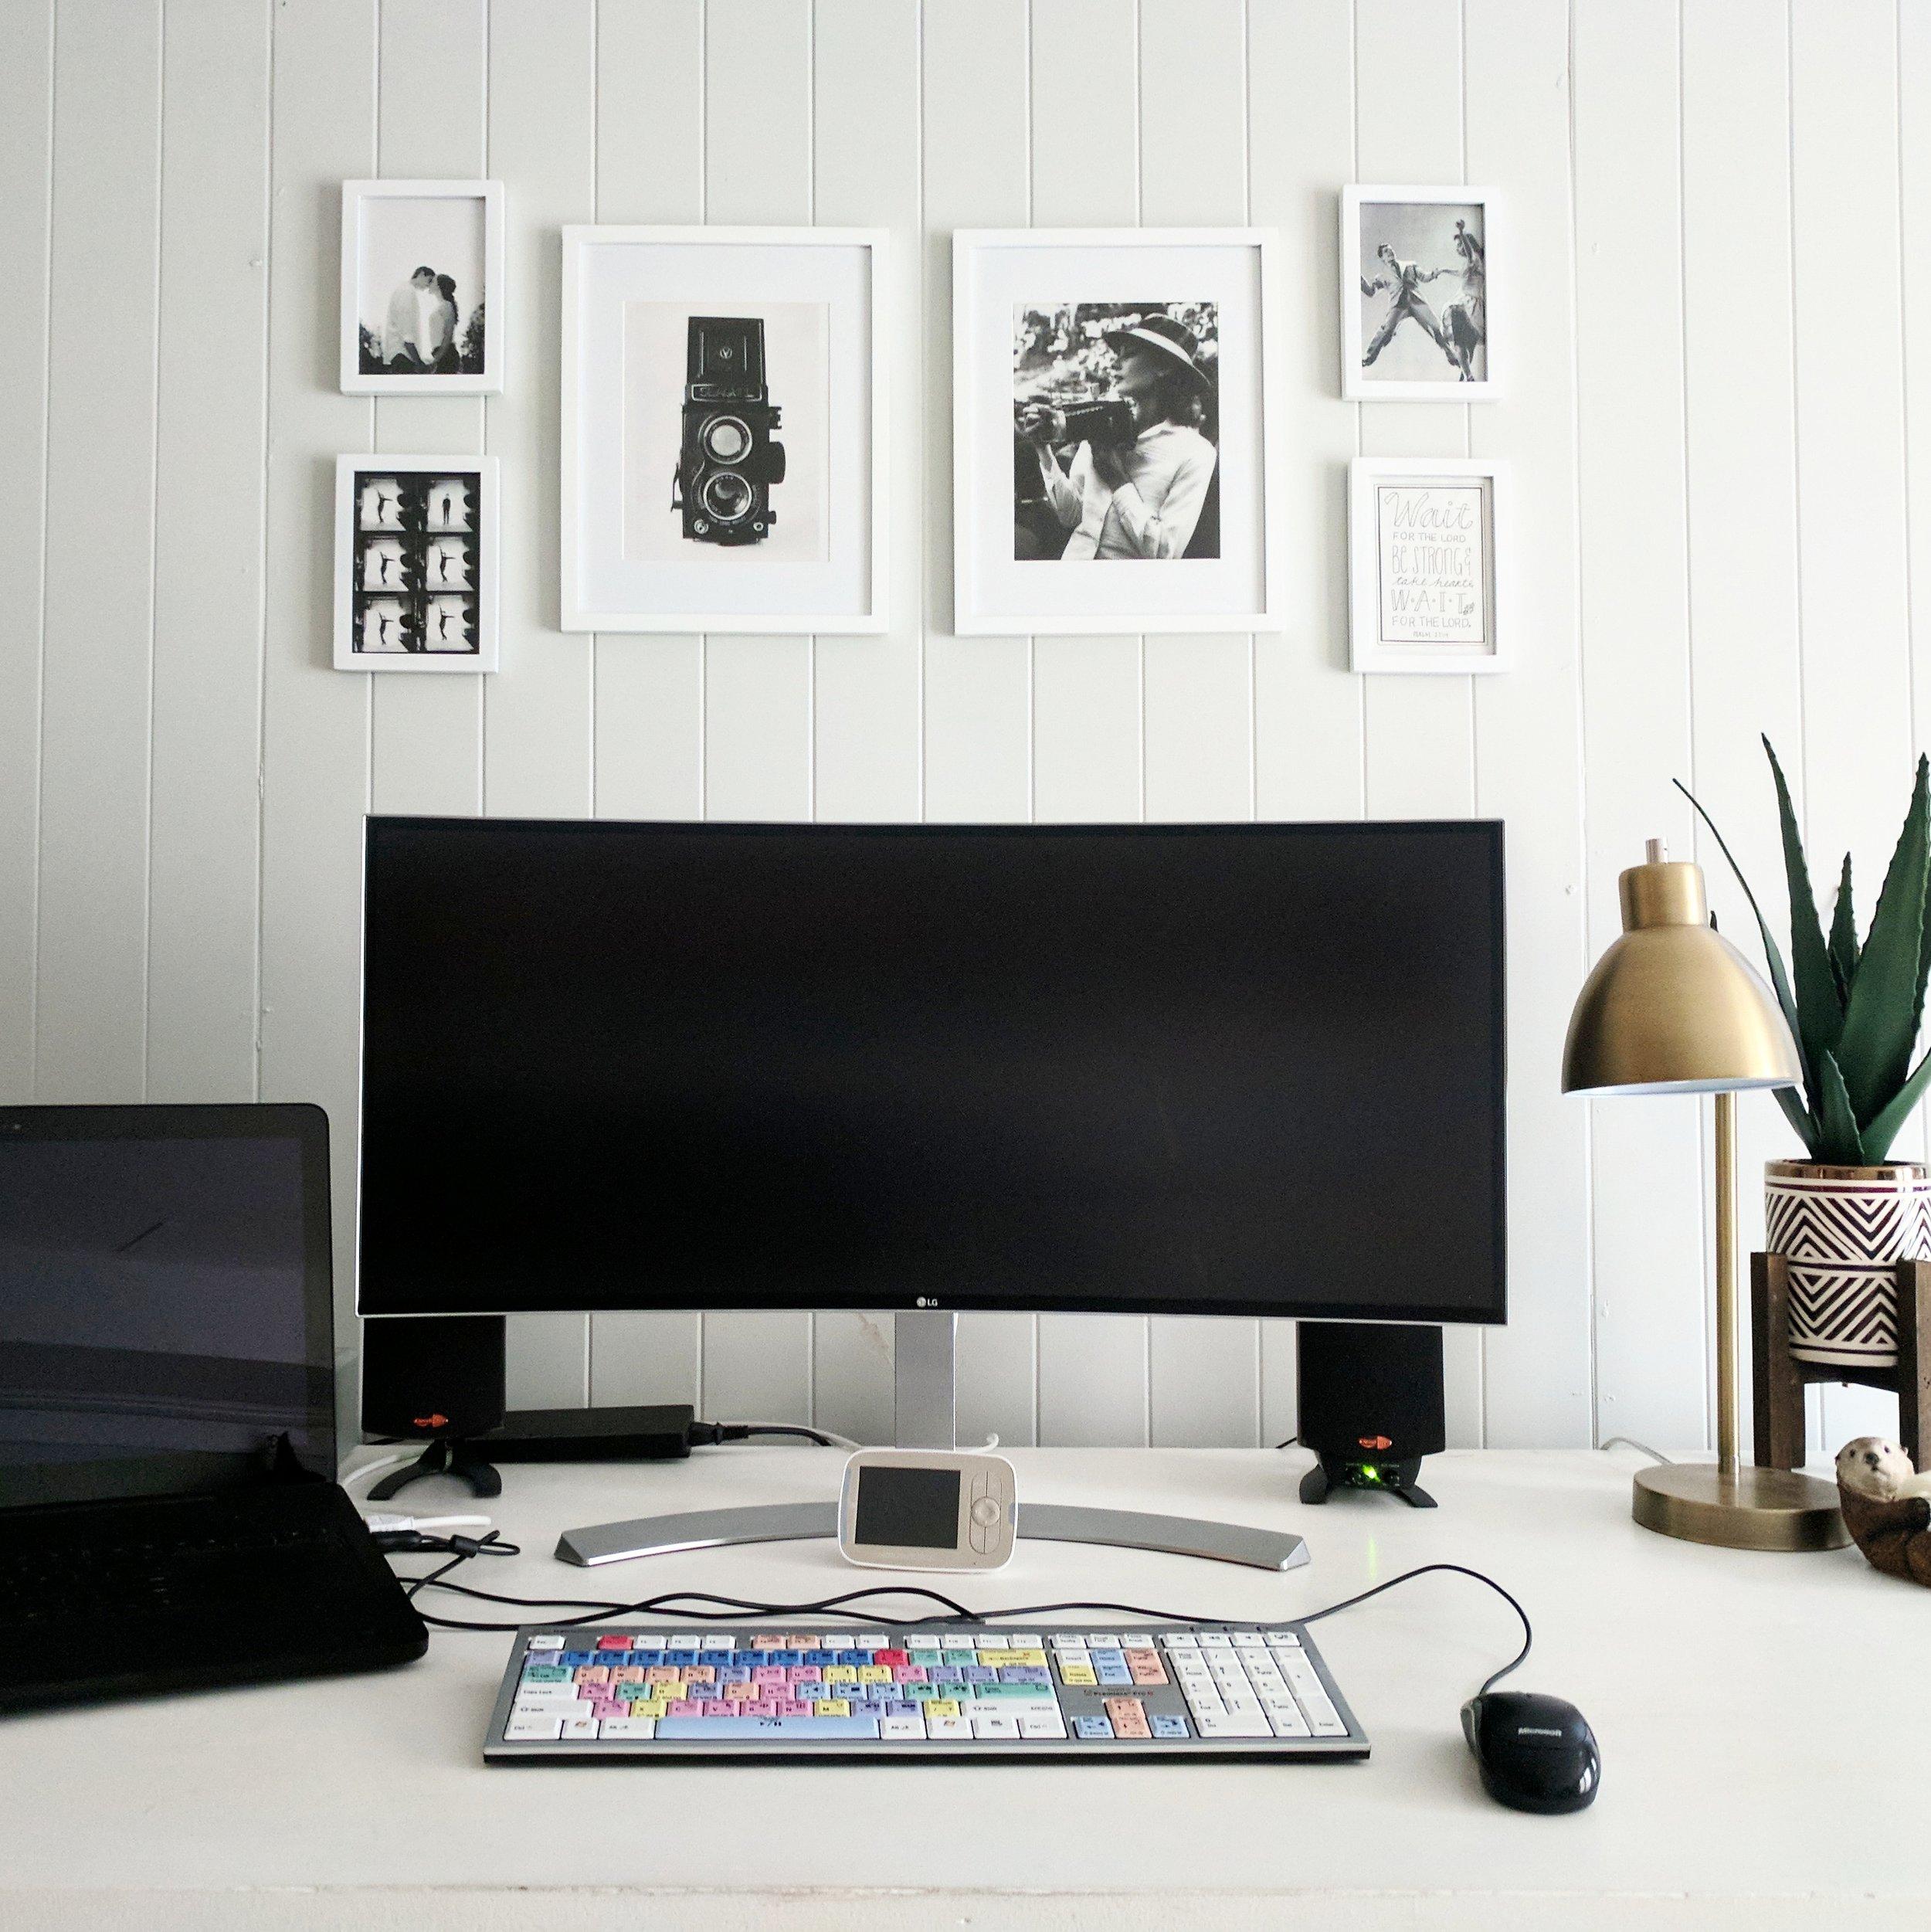 "My desk setup - 34"" curved ultrawide monitor, editing keyboard, and Razer Blade Pro."